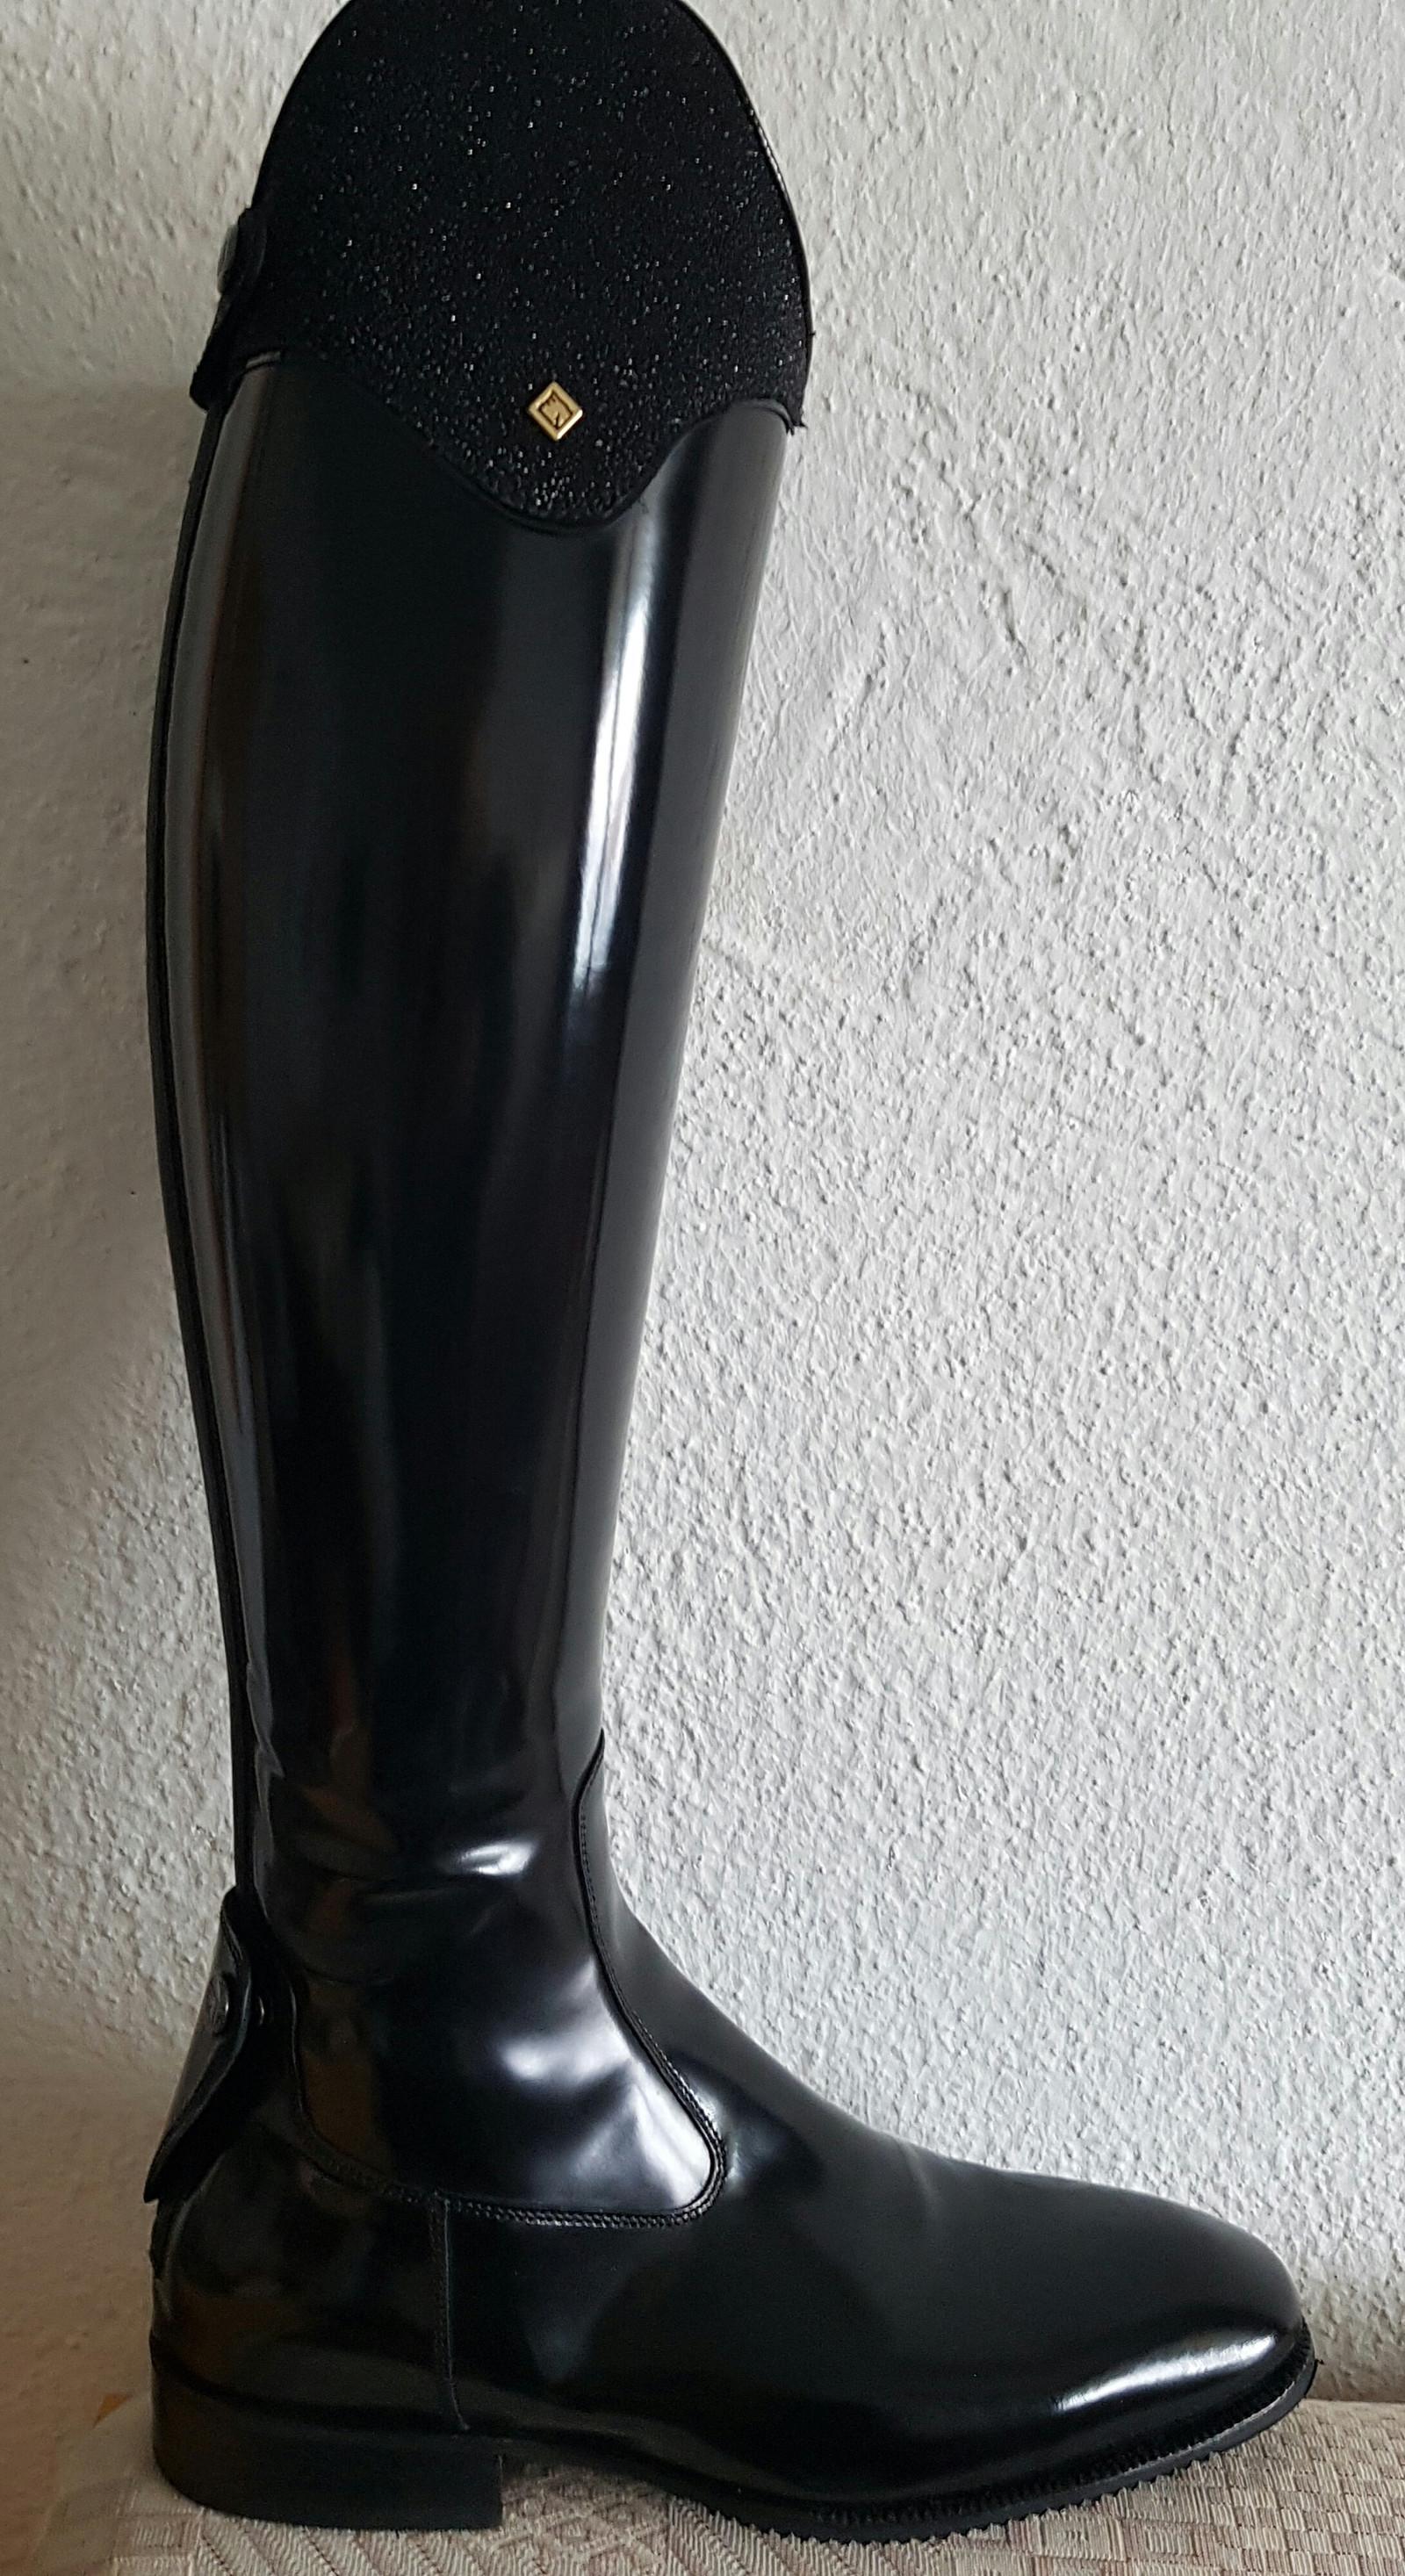 De Niro dressur ridestøvler str. 3940 | FINN.no